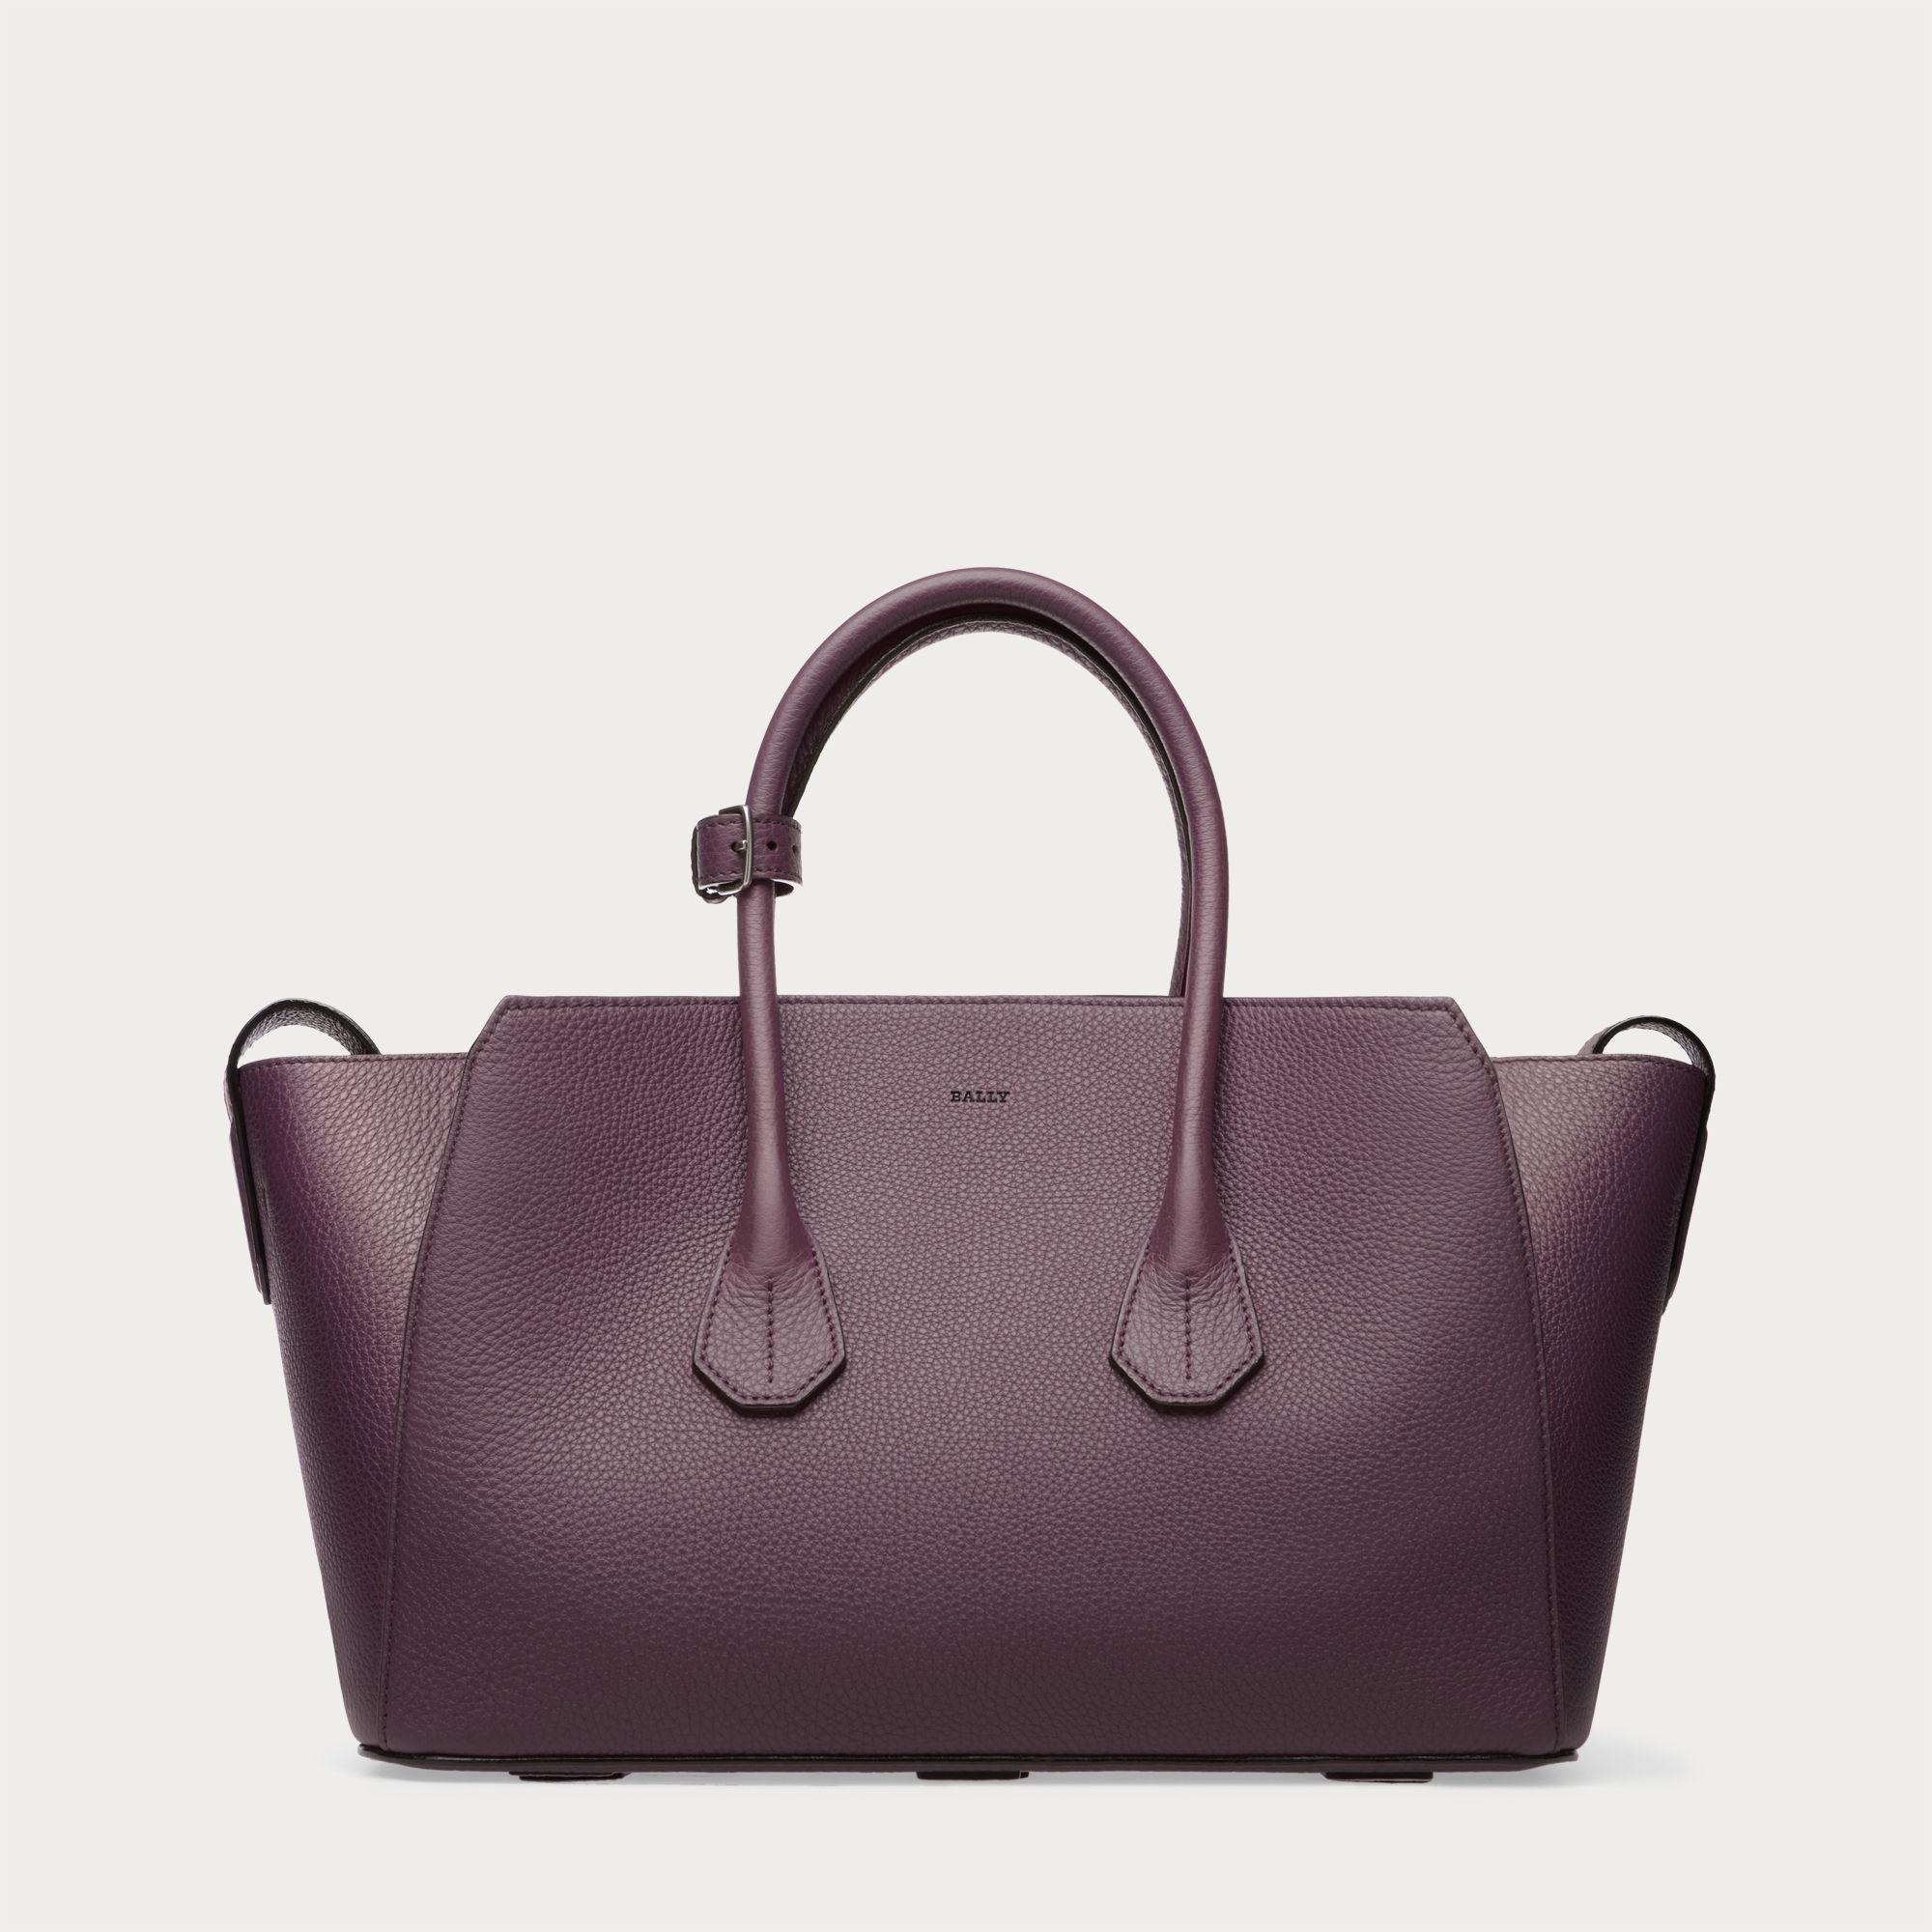 Luxury Home Shop Woman Bags Shoulder Bags BLOOM DRAWSTRING